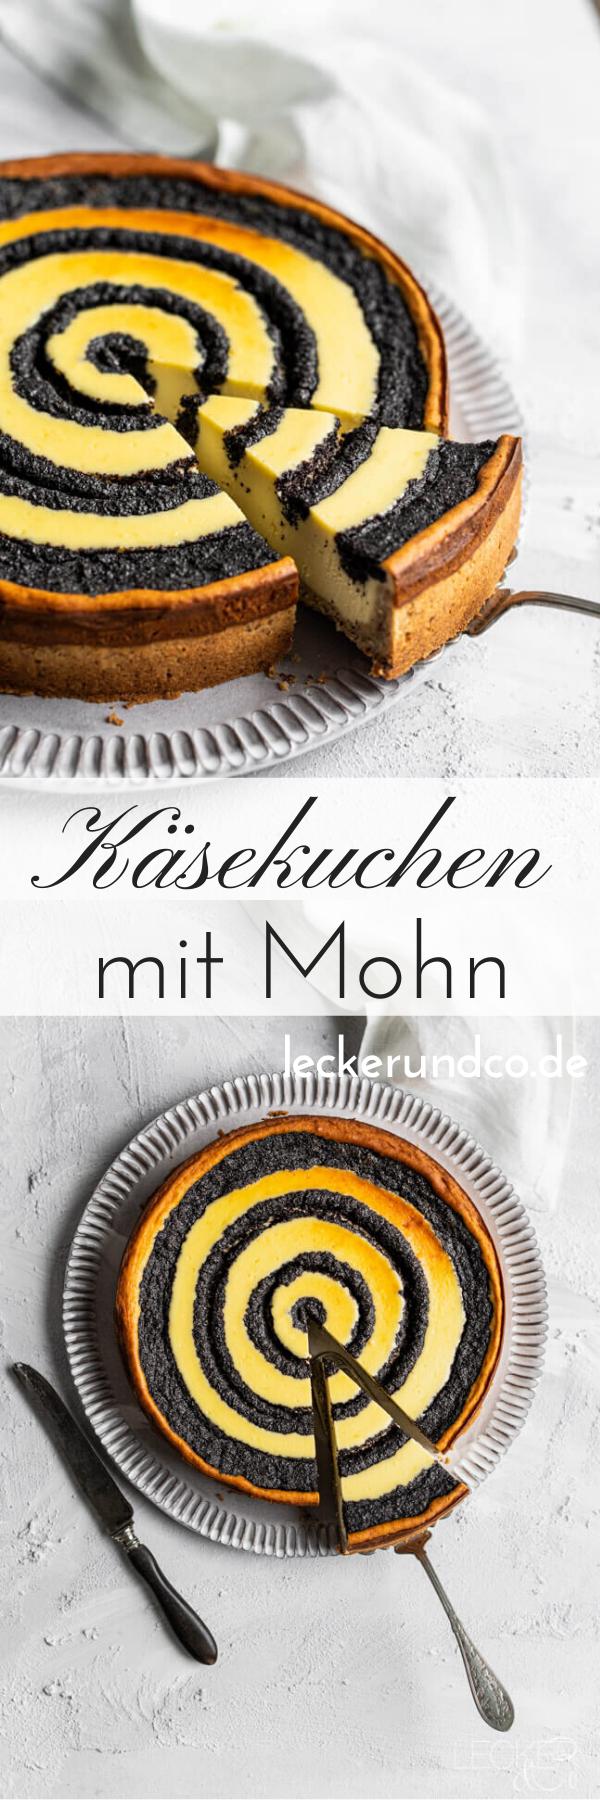 Käsekuchen mit Mohn | LECKER&Co | Foodblog aus Nürnberg